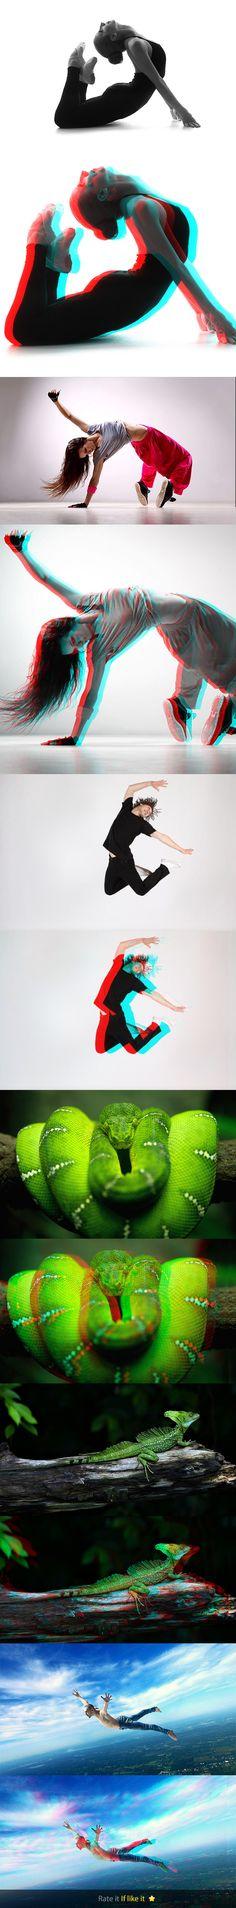 3D Photoshop Actions #photoeffect Download: http://graphicriver.net/item/3d-photoshop-actions/10576098?ref=ksioks